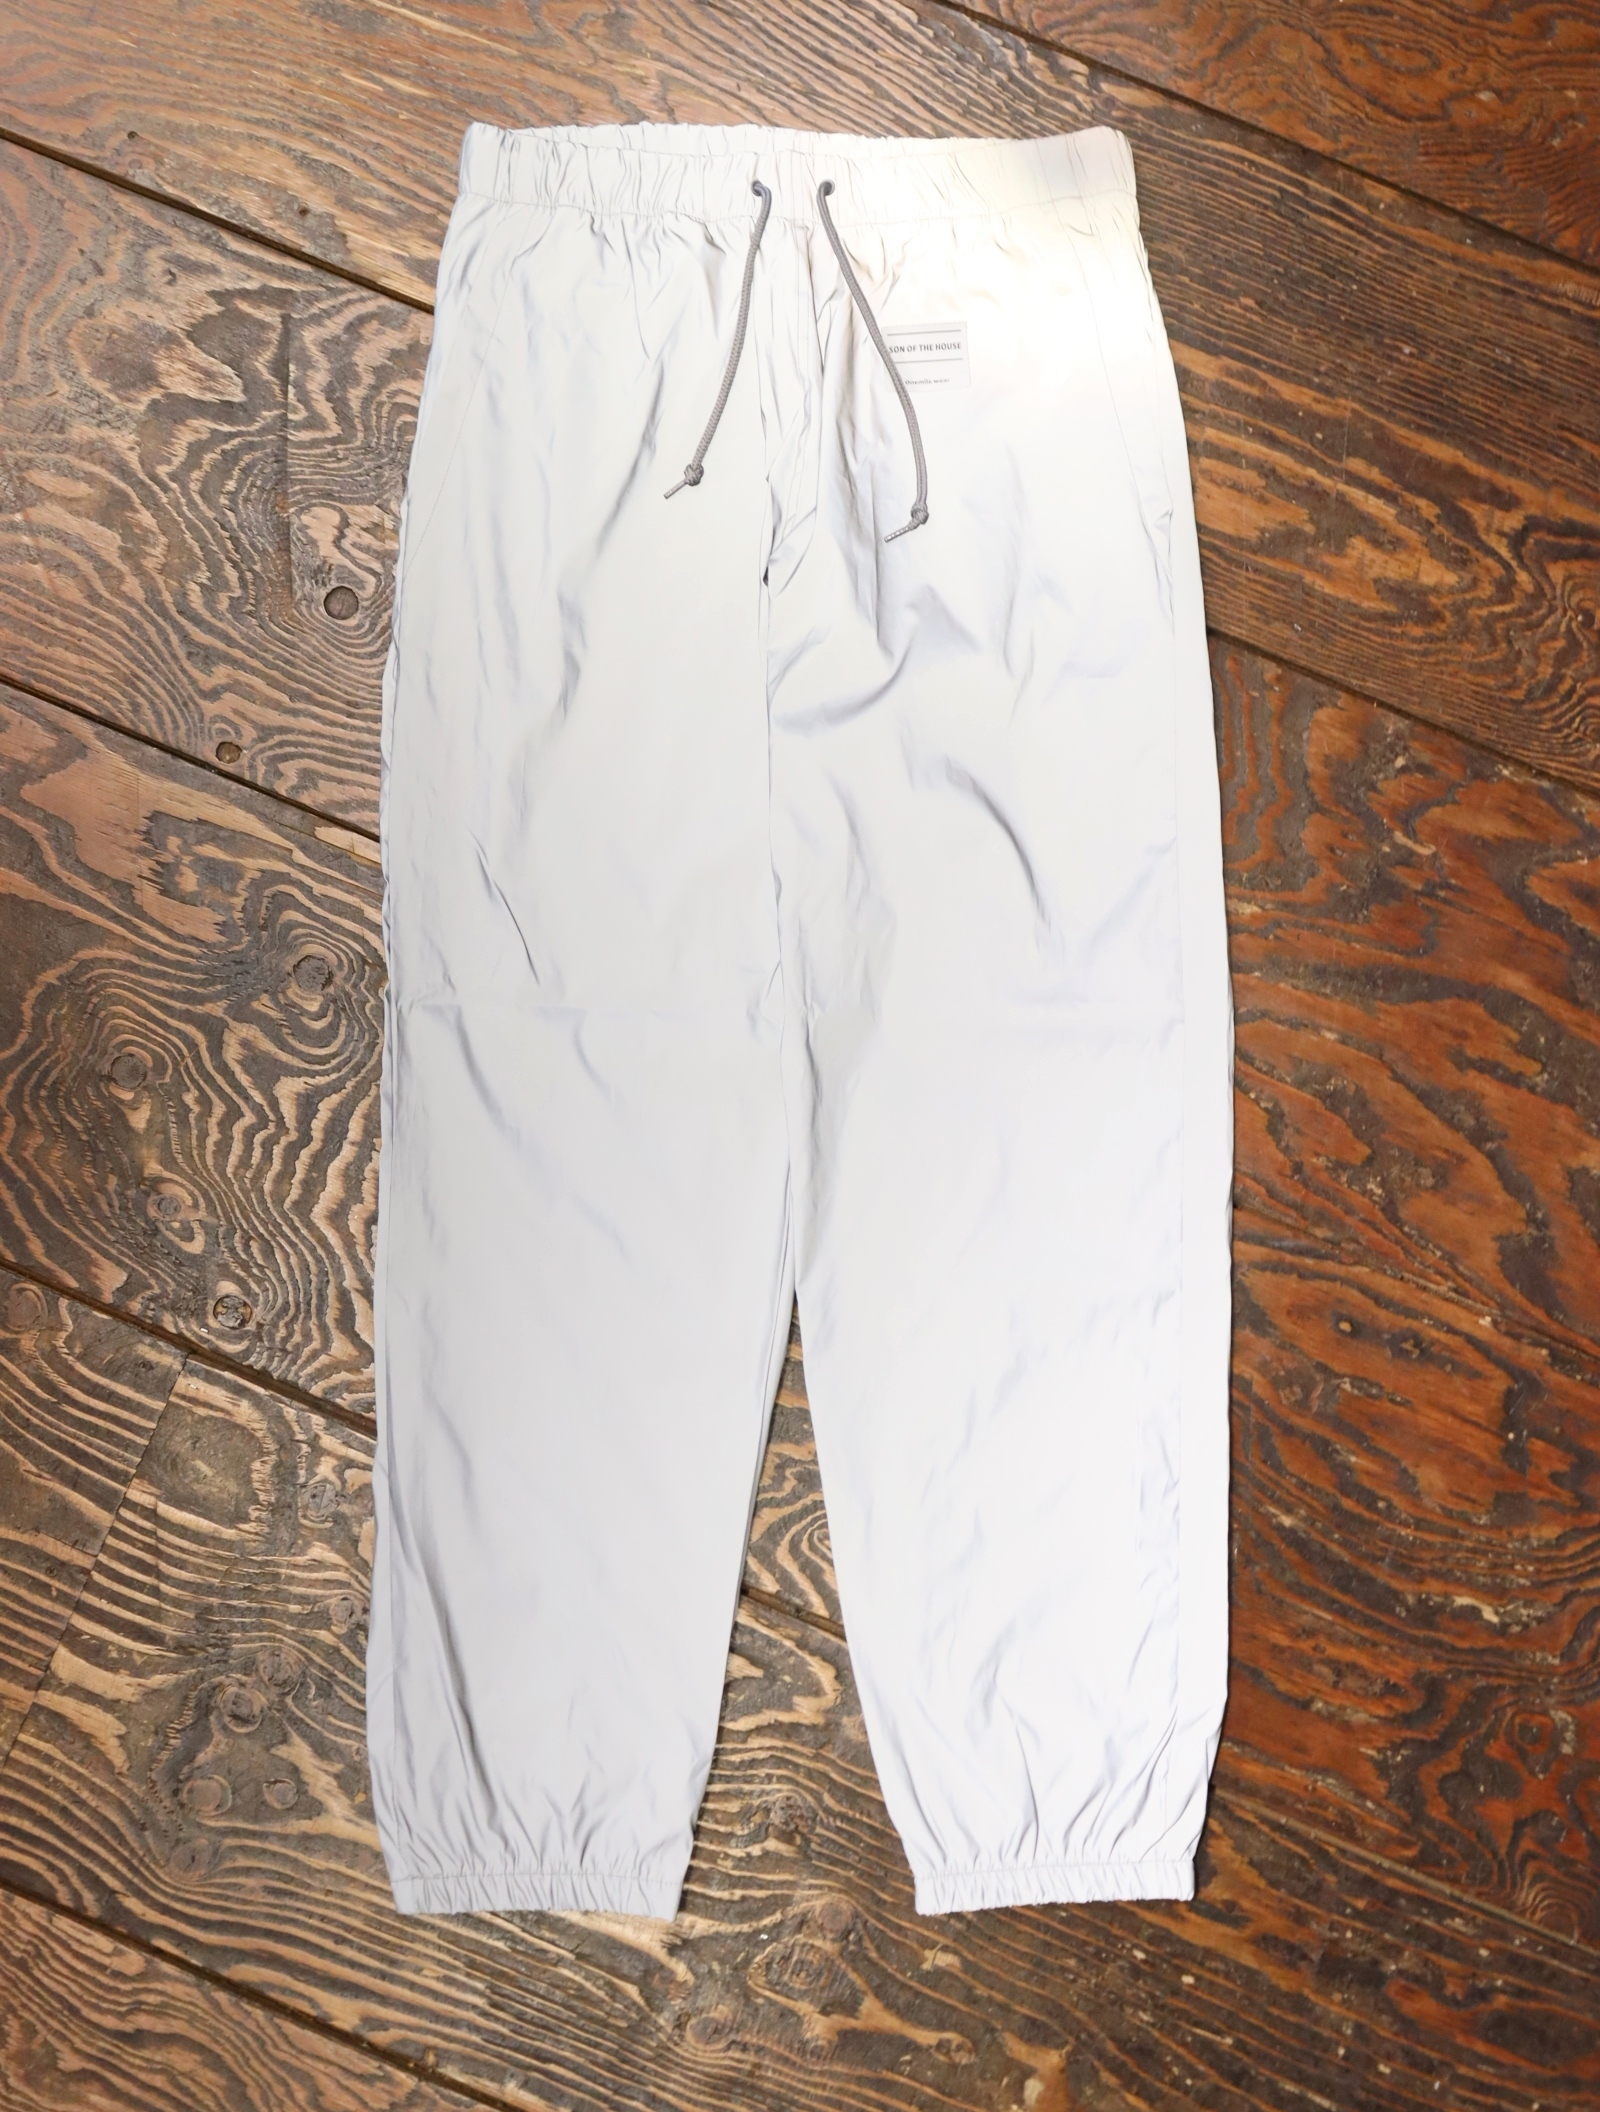 SON OF THE CHEESE  「REF Pants (SILVER)」  リフレクターイージーパンツ